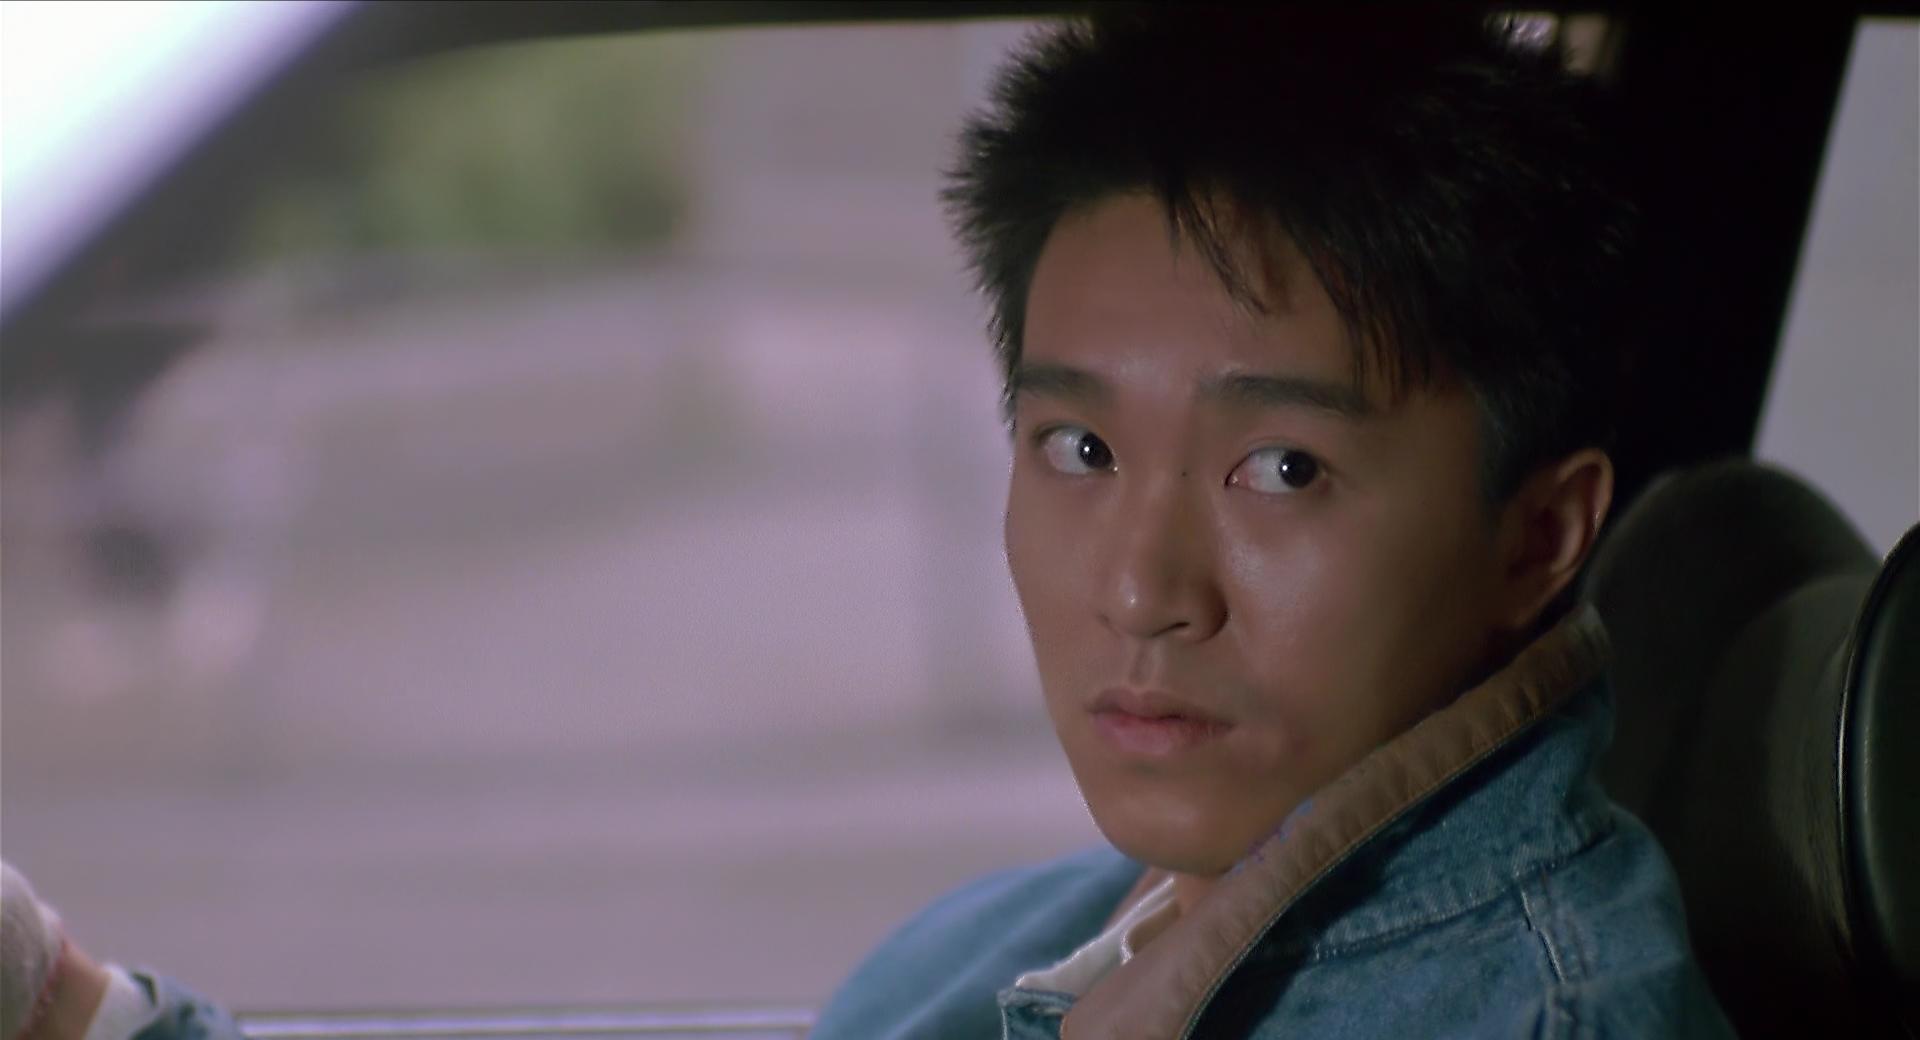 Hài] Final Justice 1988 BluRay 1080p x265 10bit 2Audio MNHD-FRDS-USLT ~  Phán Xét Cuối Cùng | HDVietnam.com